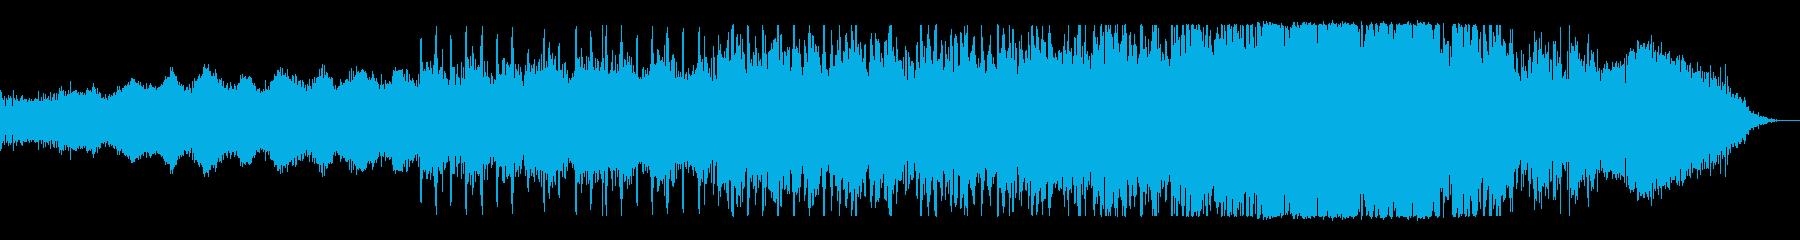 KANTノイズホラーBGM200723の再生済みの波形